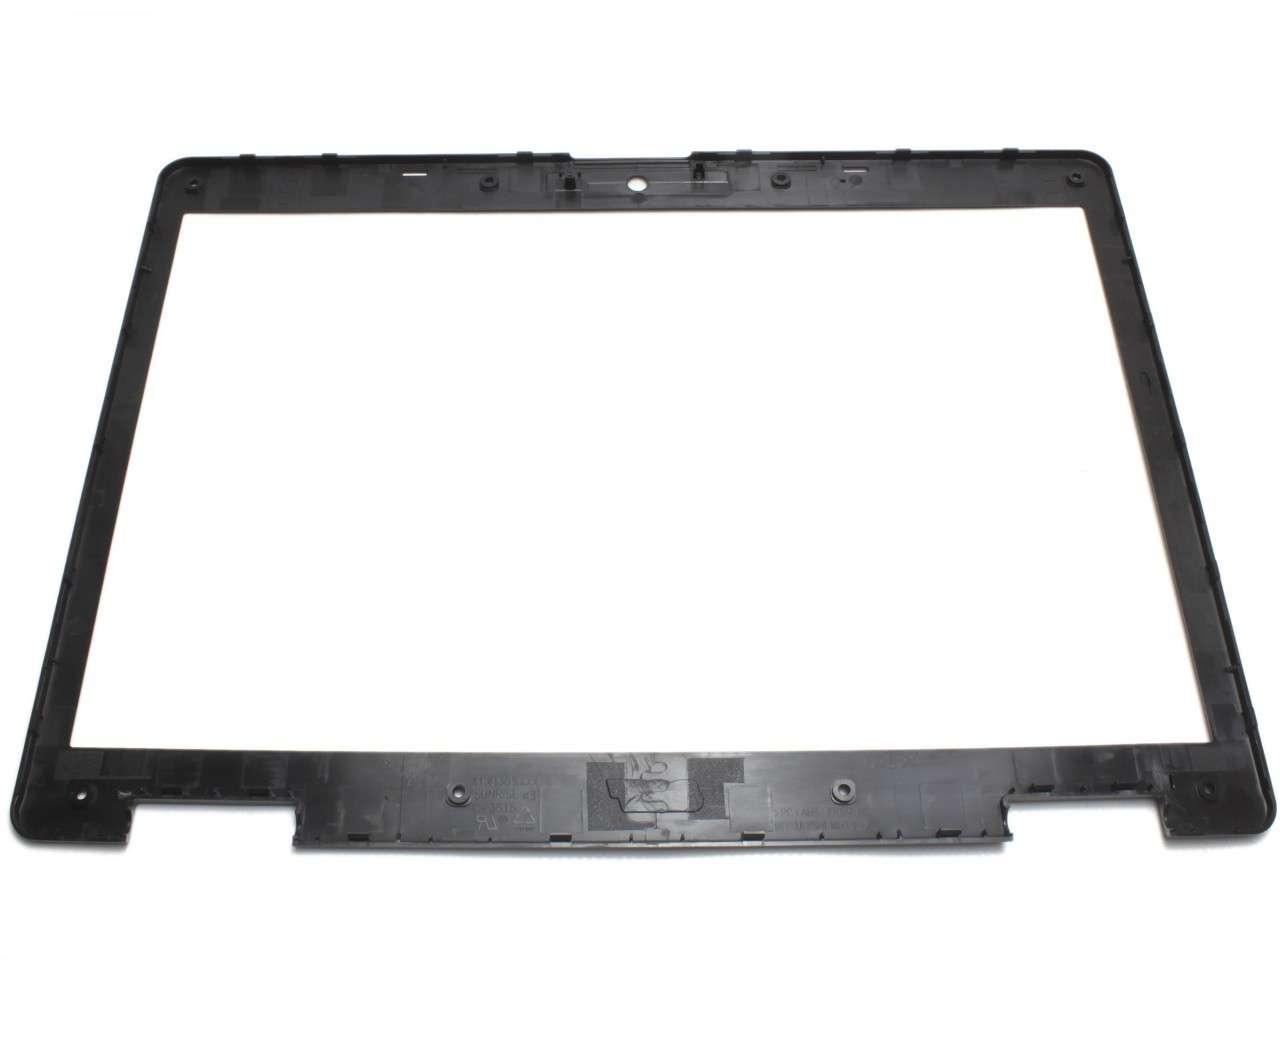 Rama Display Acer Extensa 5210 Bezel Front Cover Neagra imagine